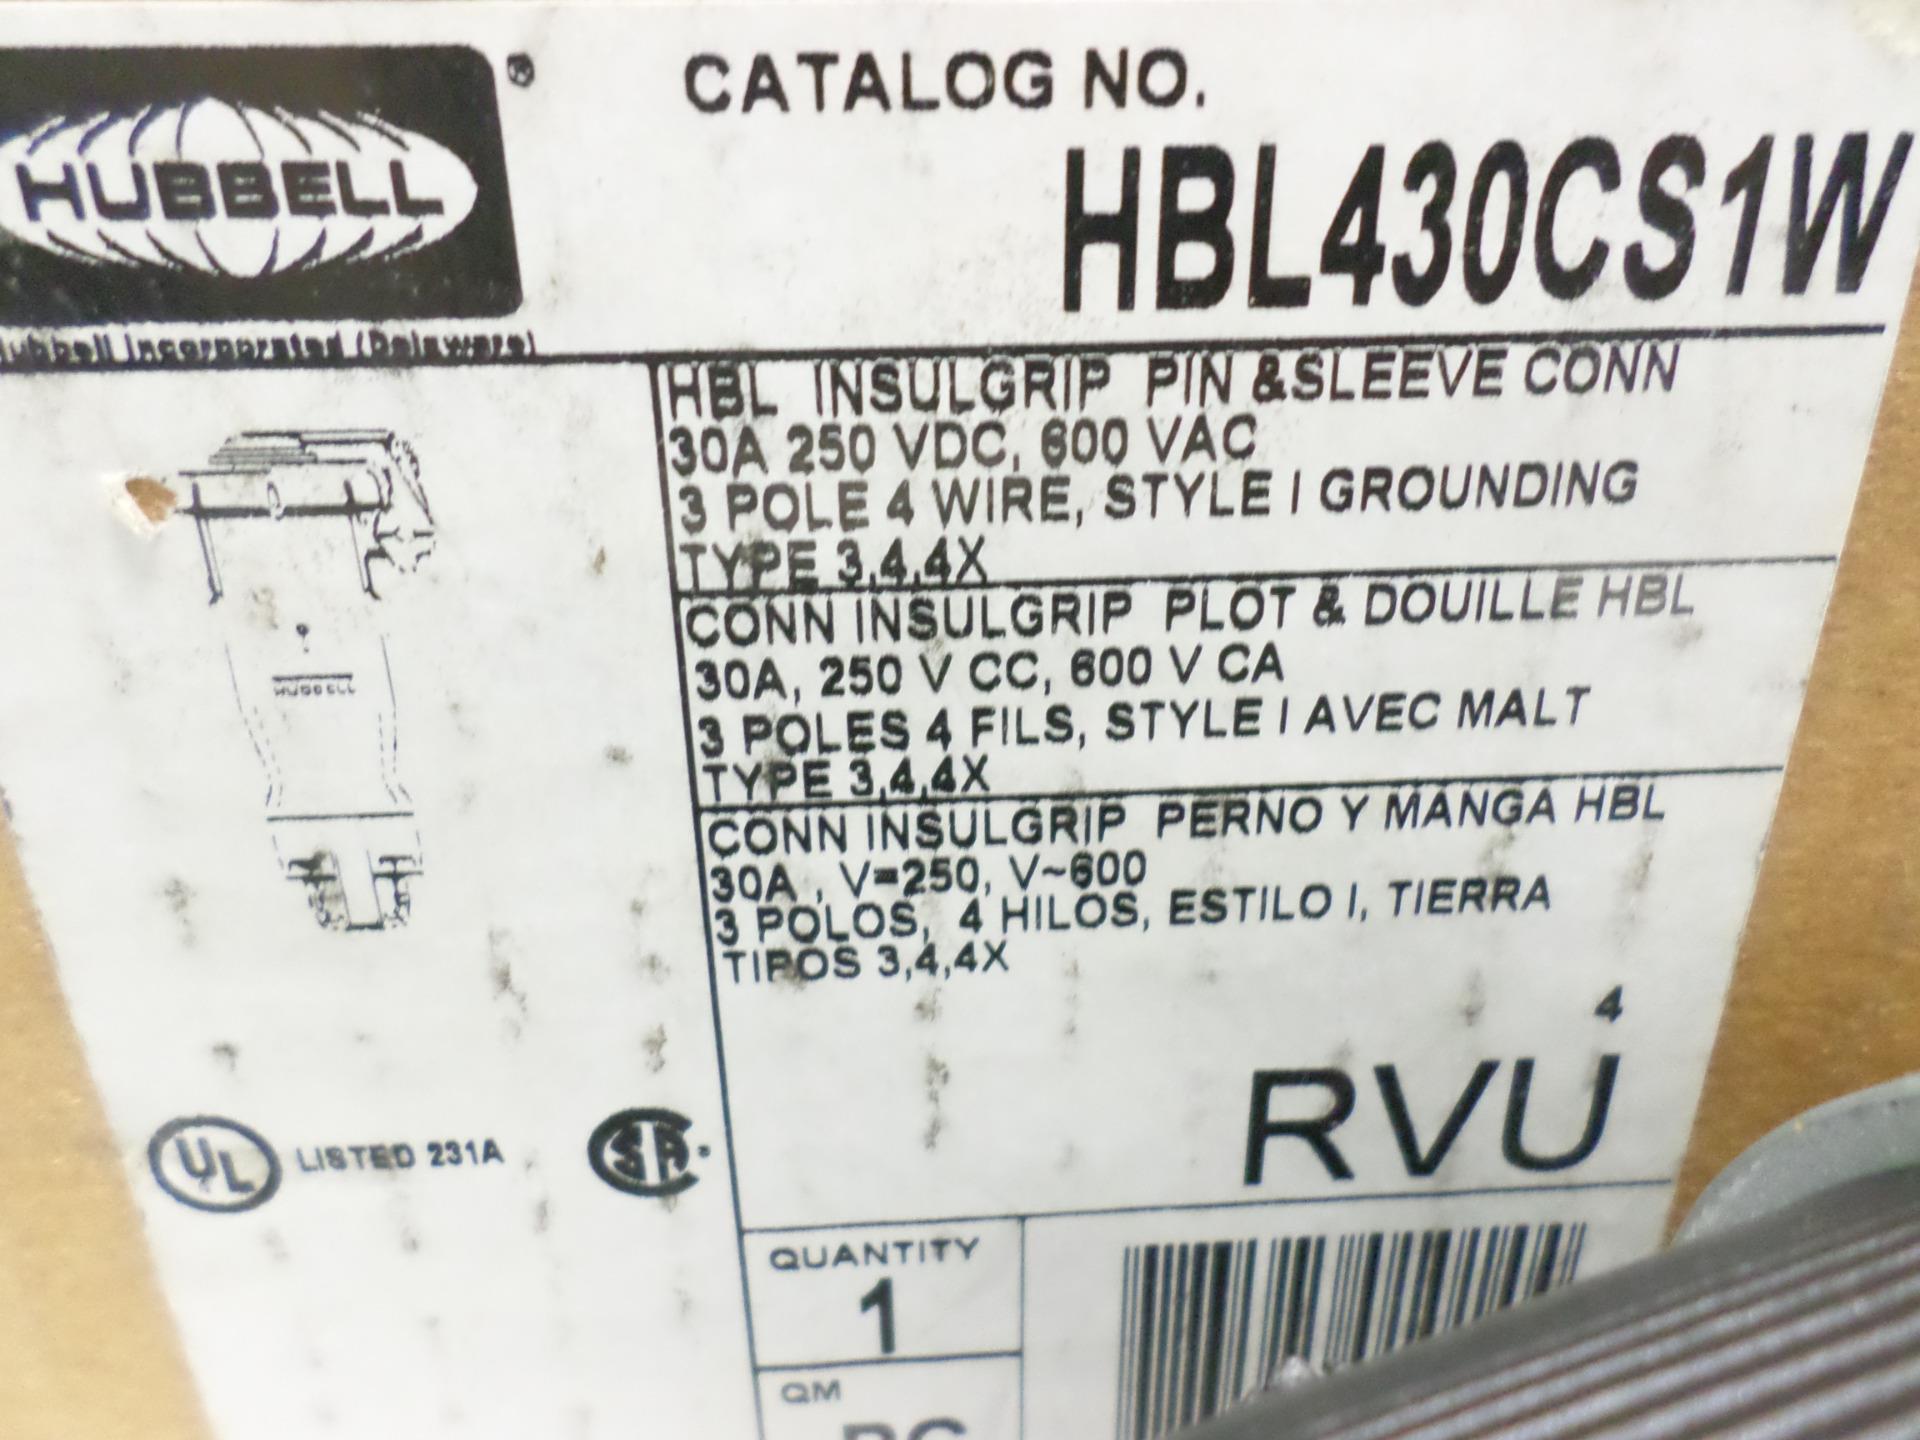 Hubbell Wiring Device Pin Sleeve Connector 30a Hbl430cs1w Nib Ebay Catalog Lsjch08262016 Shelf51 15321 Jobcodeham72116 Lsjch08272016 15322